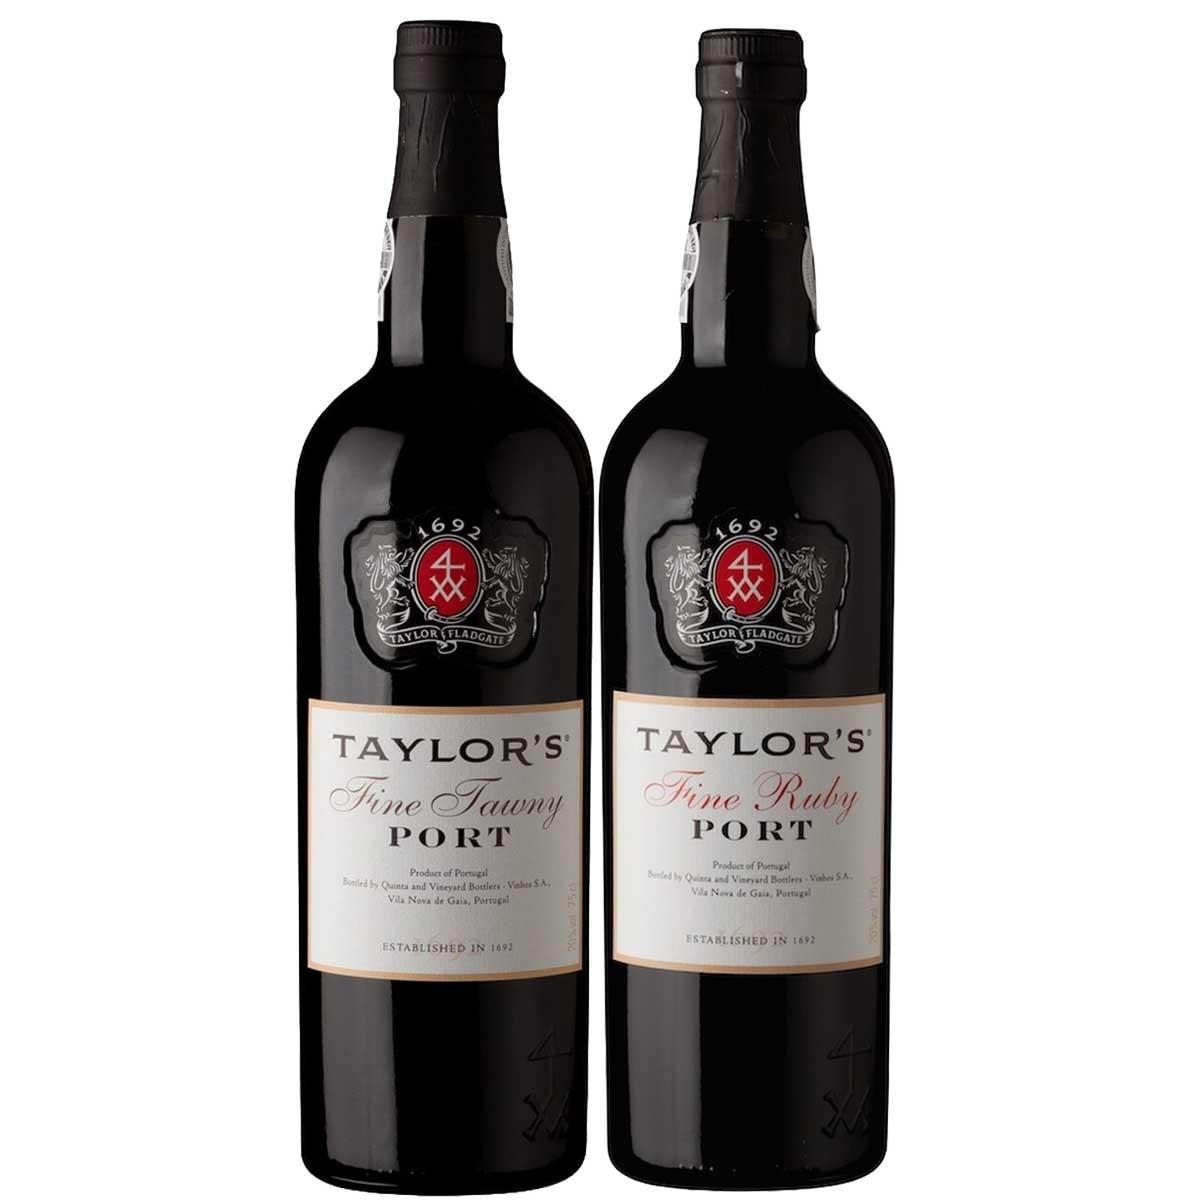 Kit 2x Vinho do Porto Tinto Ruby e Tawny Taylor's Português